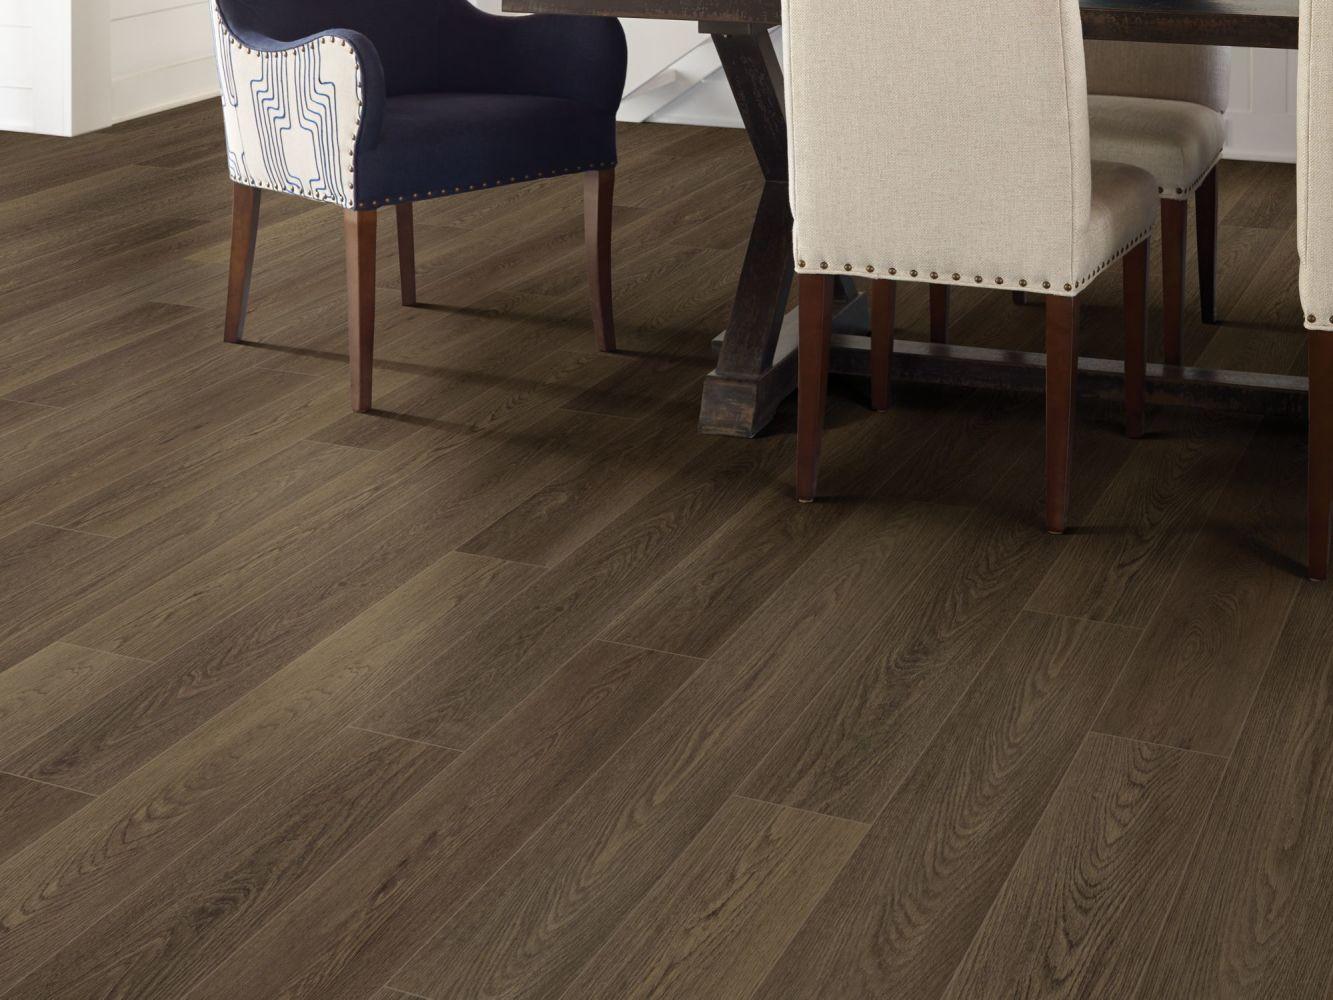 Shaw Floors Resilient Property Solutions Prominence Plus Barrel Oak 07066_VE381